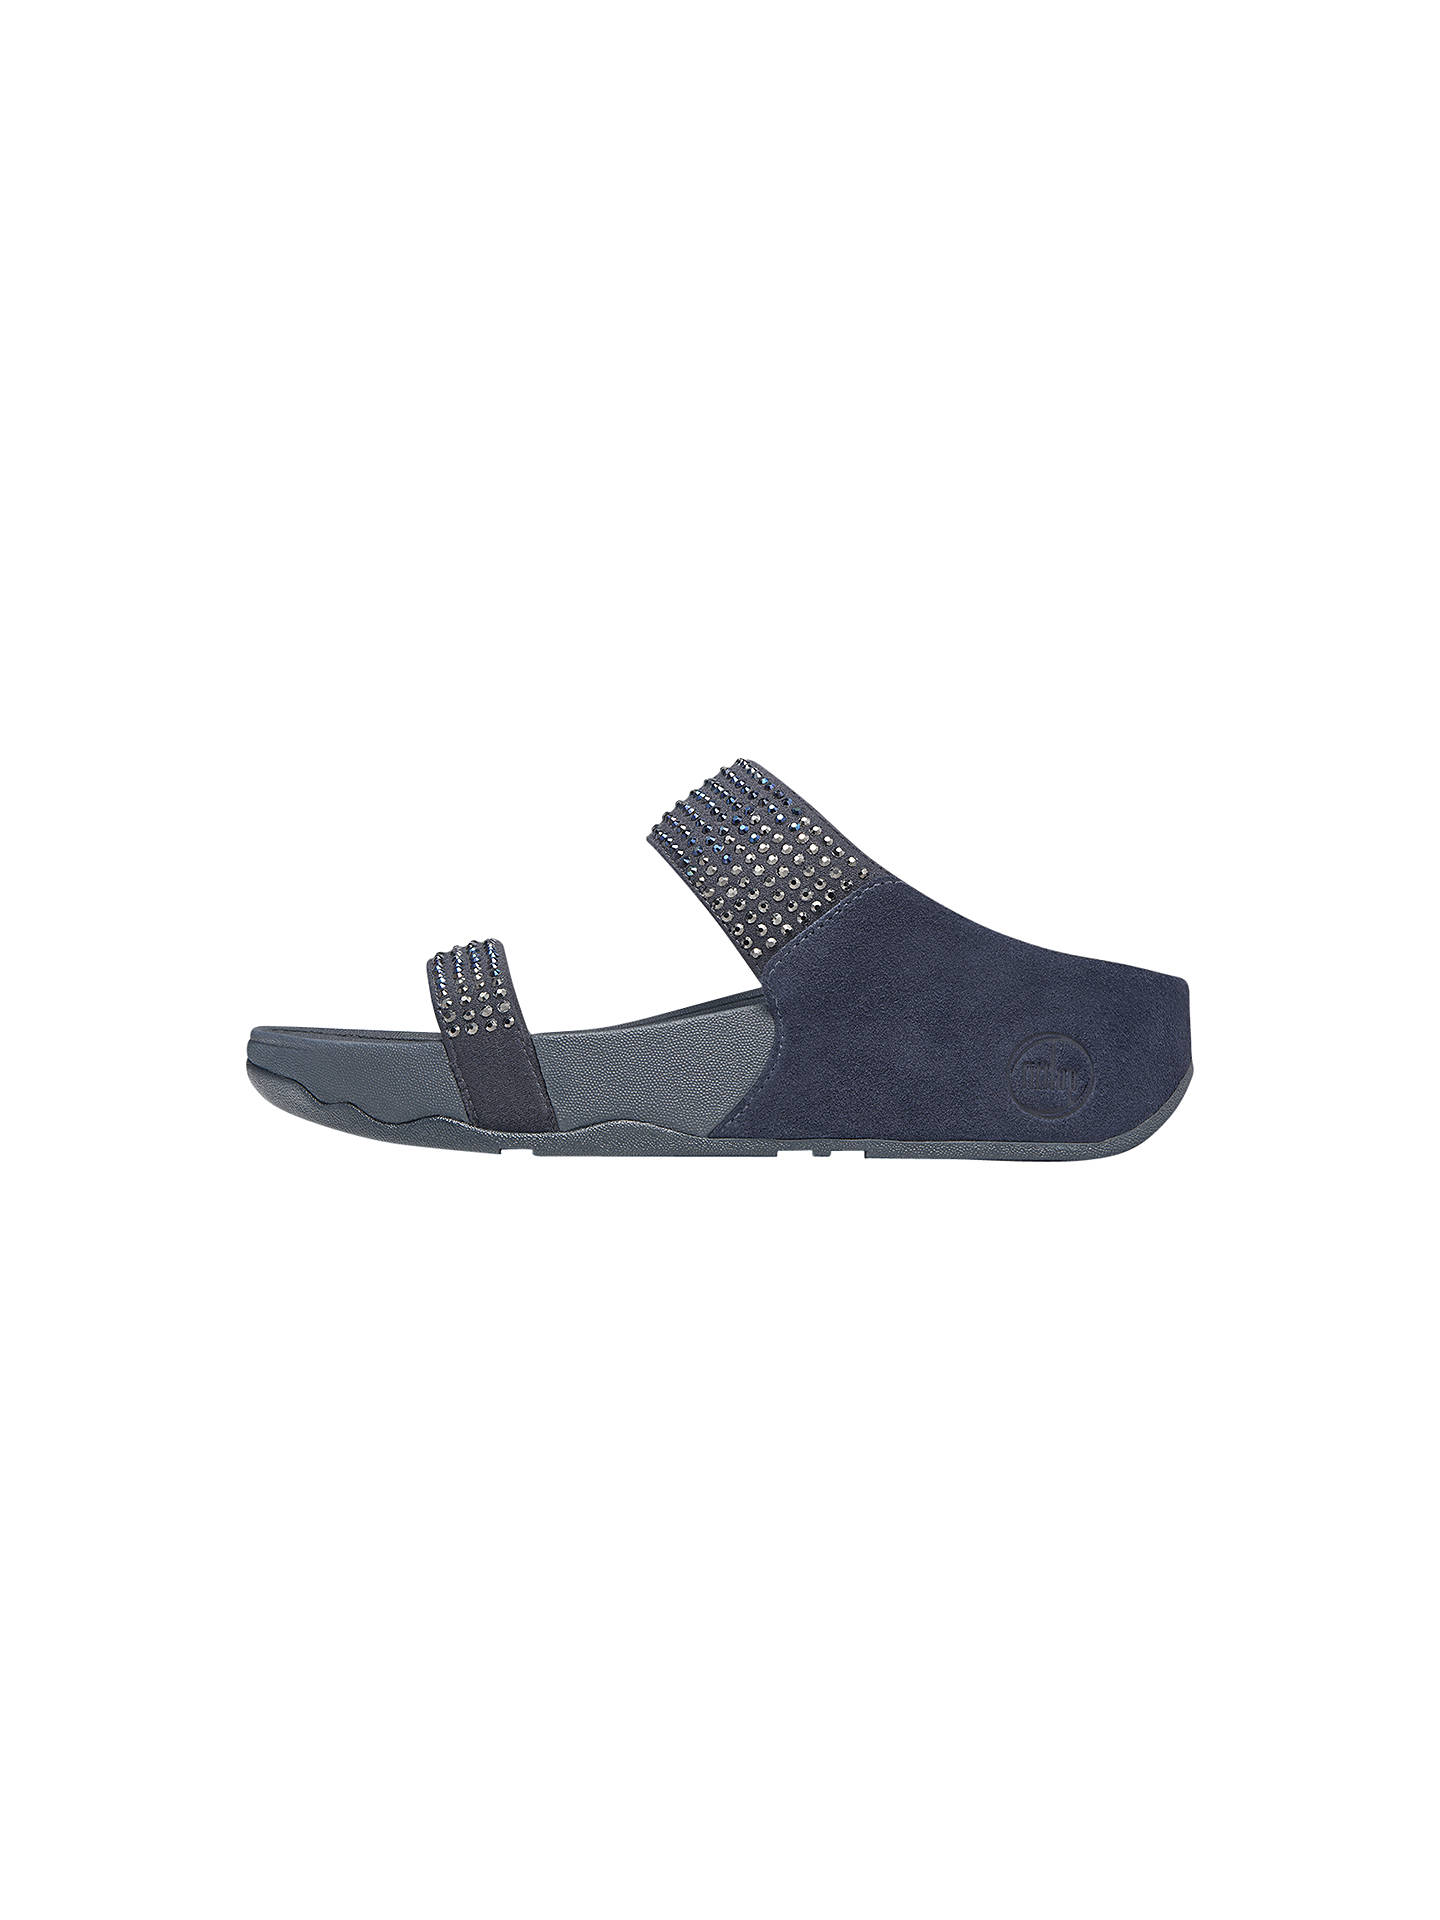 e40feb6e28d4 ... Buy FitFlop Flare Slide Suede Double Strap Flatform Sandals